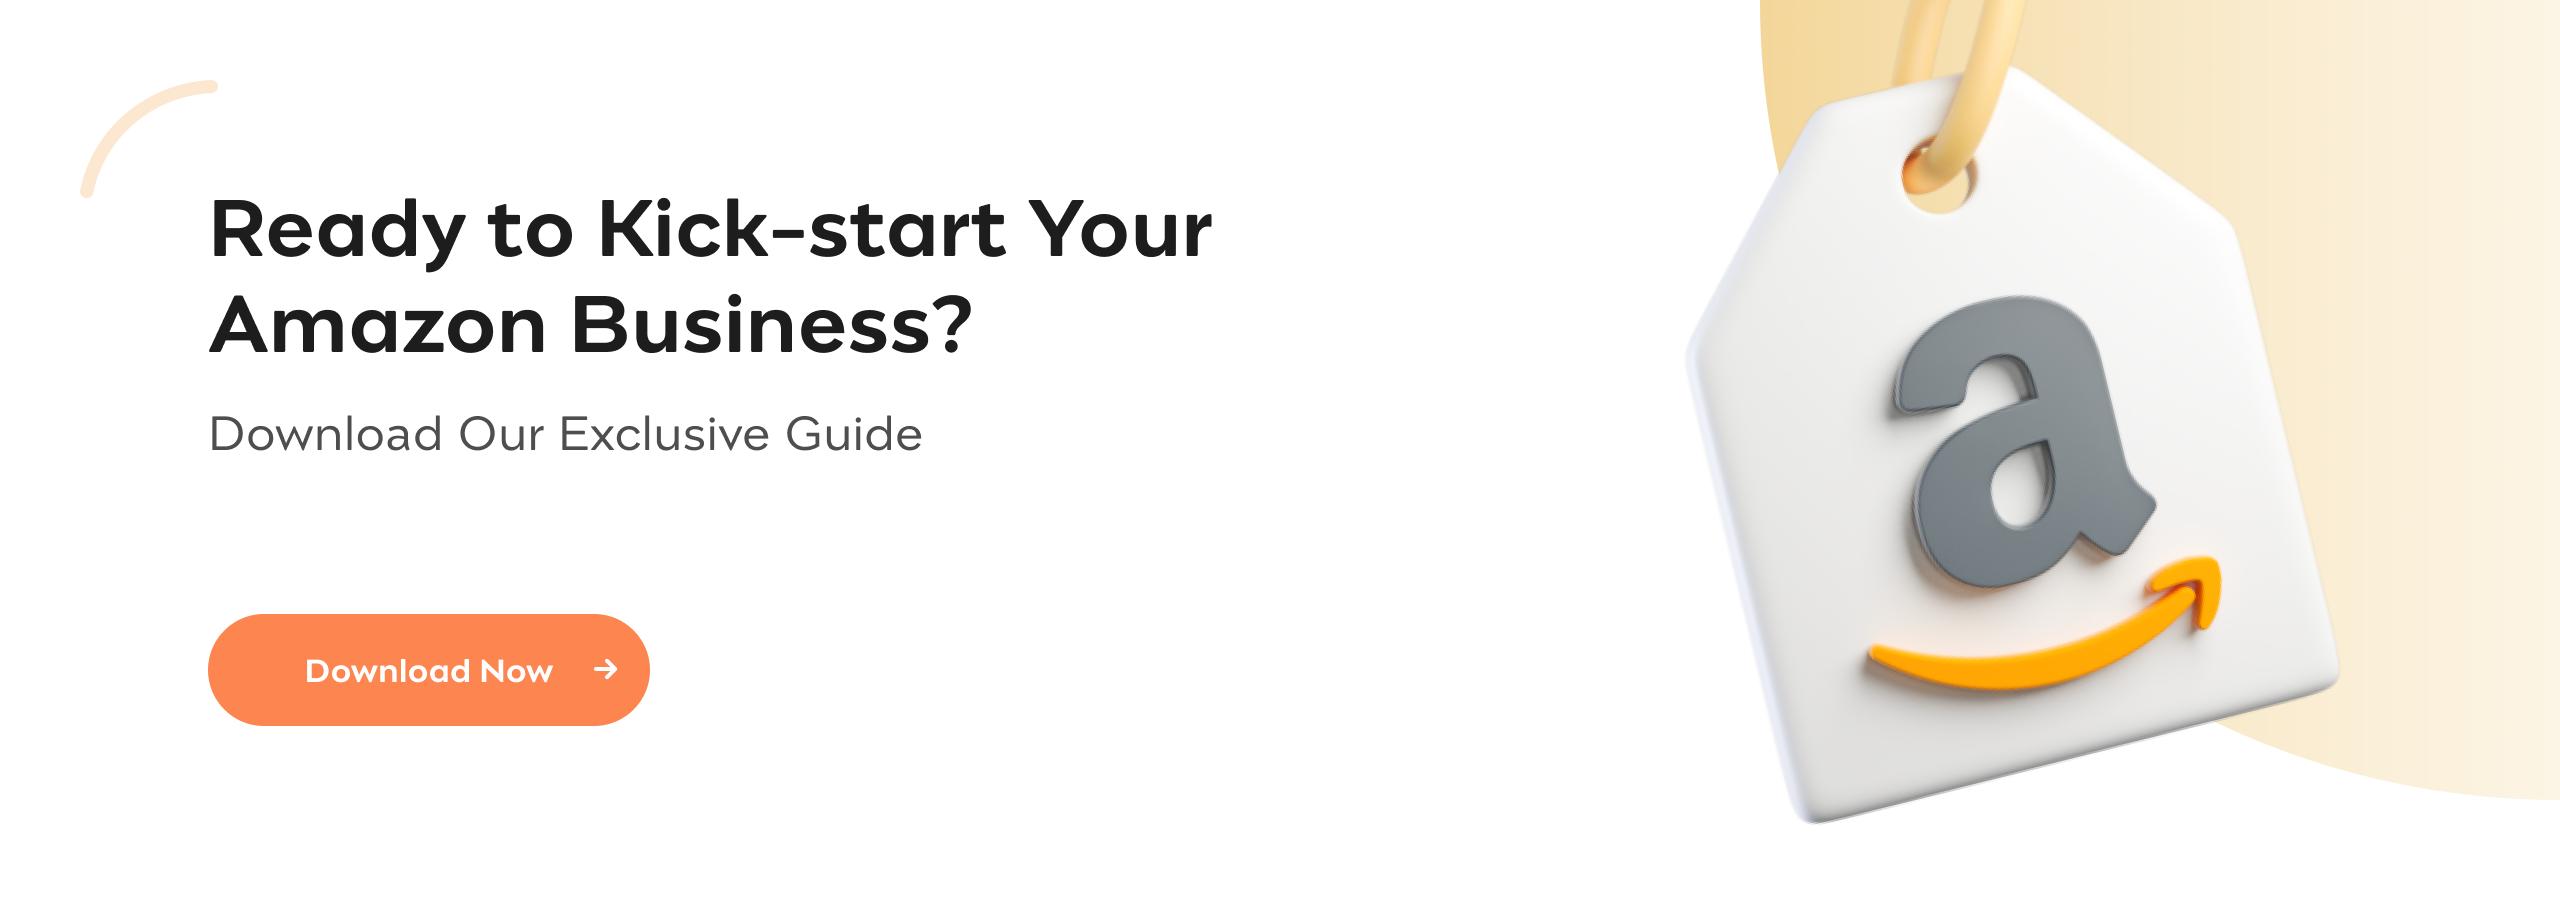 Start an Amazon Business